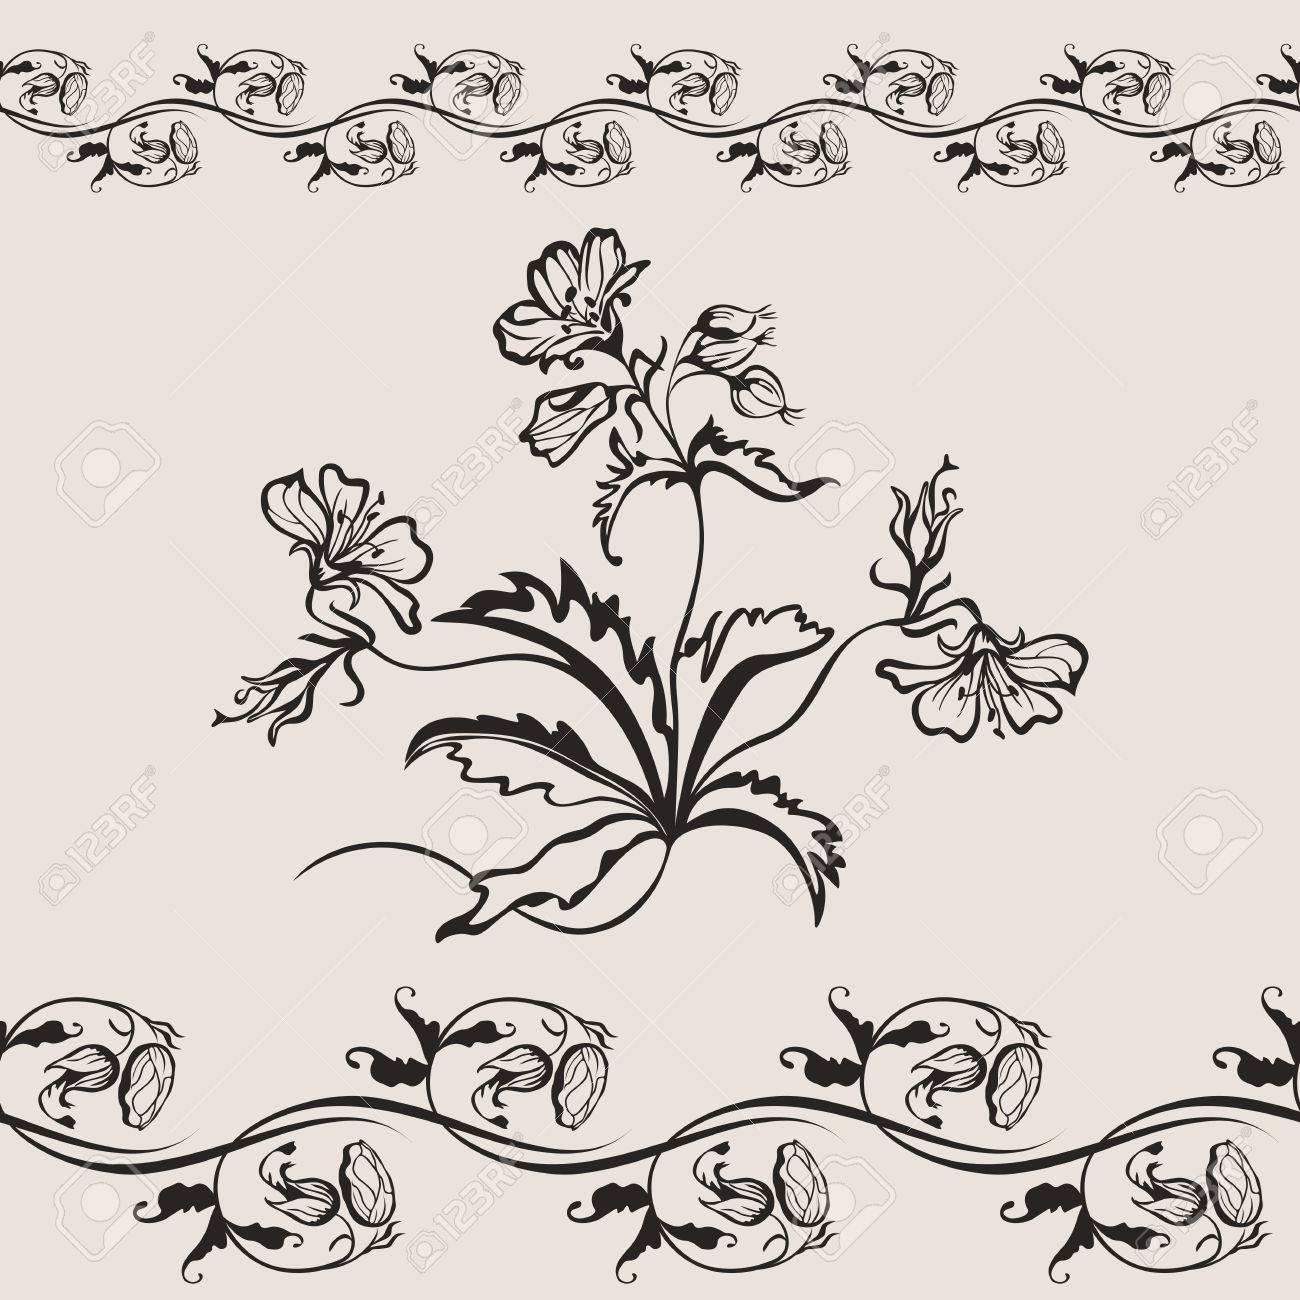 Dessin Motif Fleur Peinture Agrandi Seamless Banniere Clip Art